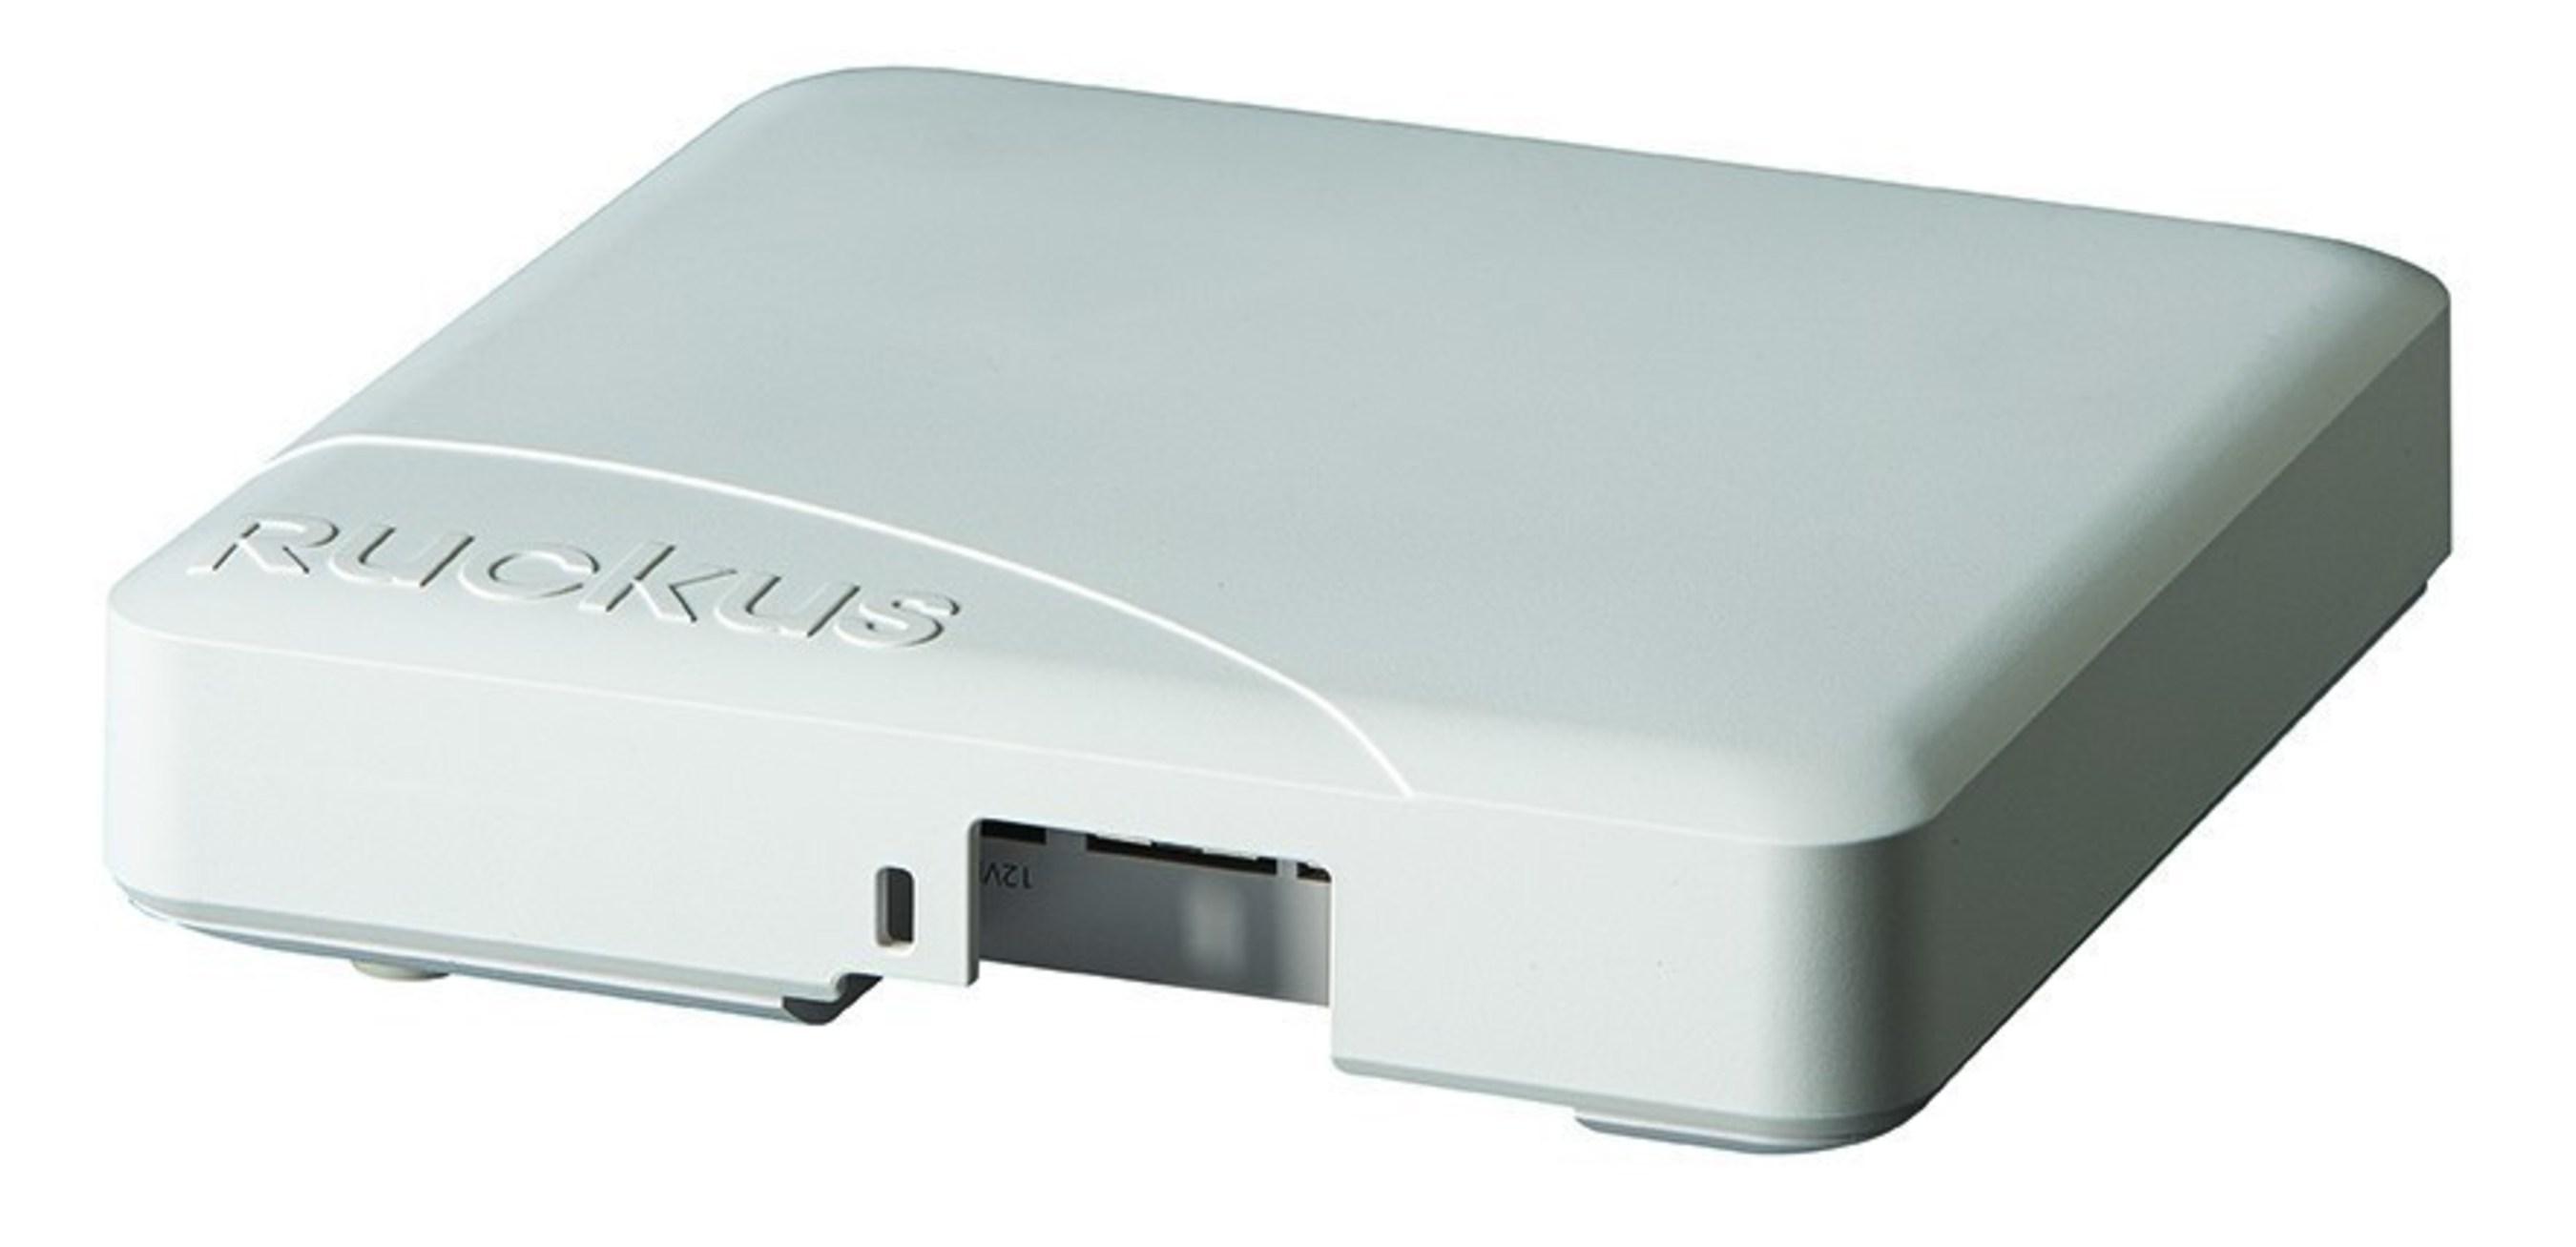 New Ruckus ZoneFlex(TM) R500 indoor Smart 802.11ac Wi-Fi access point